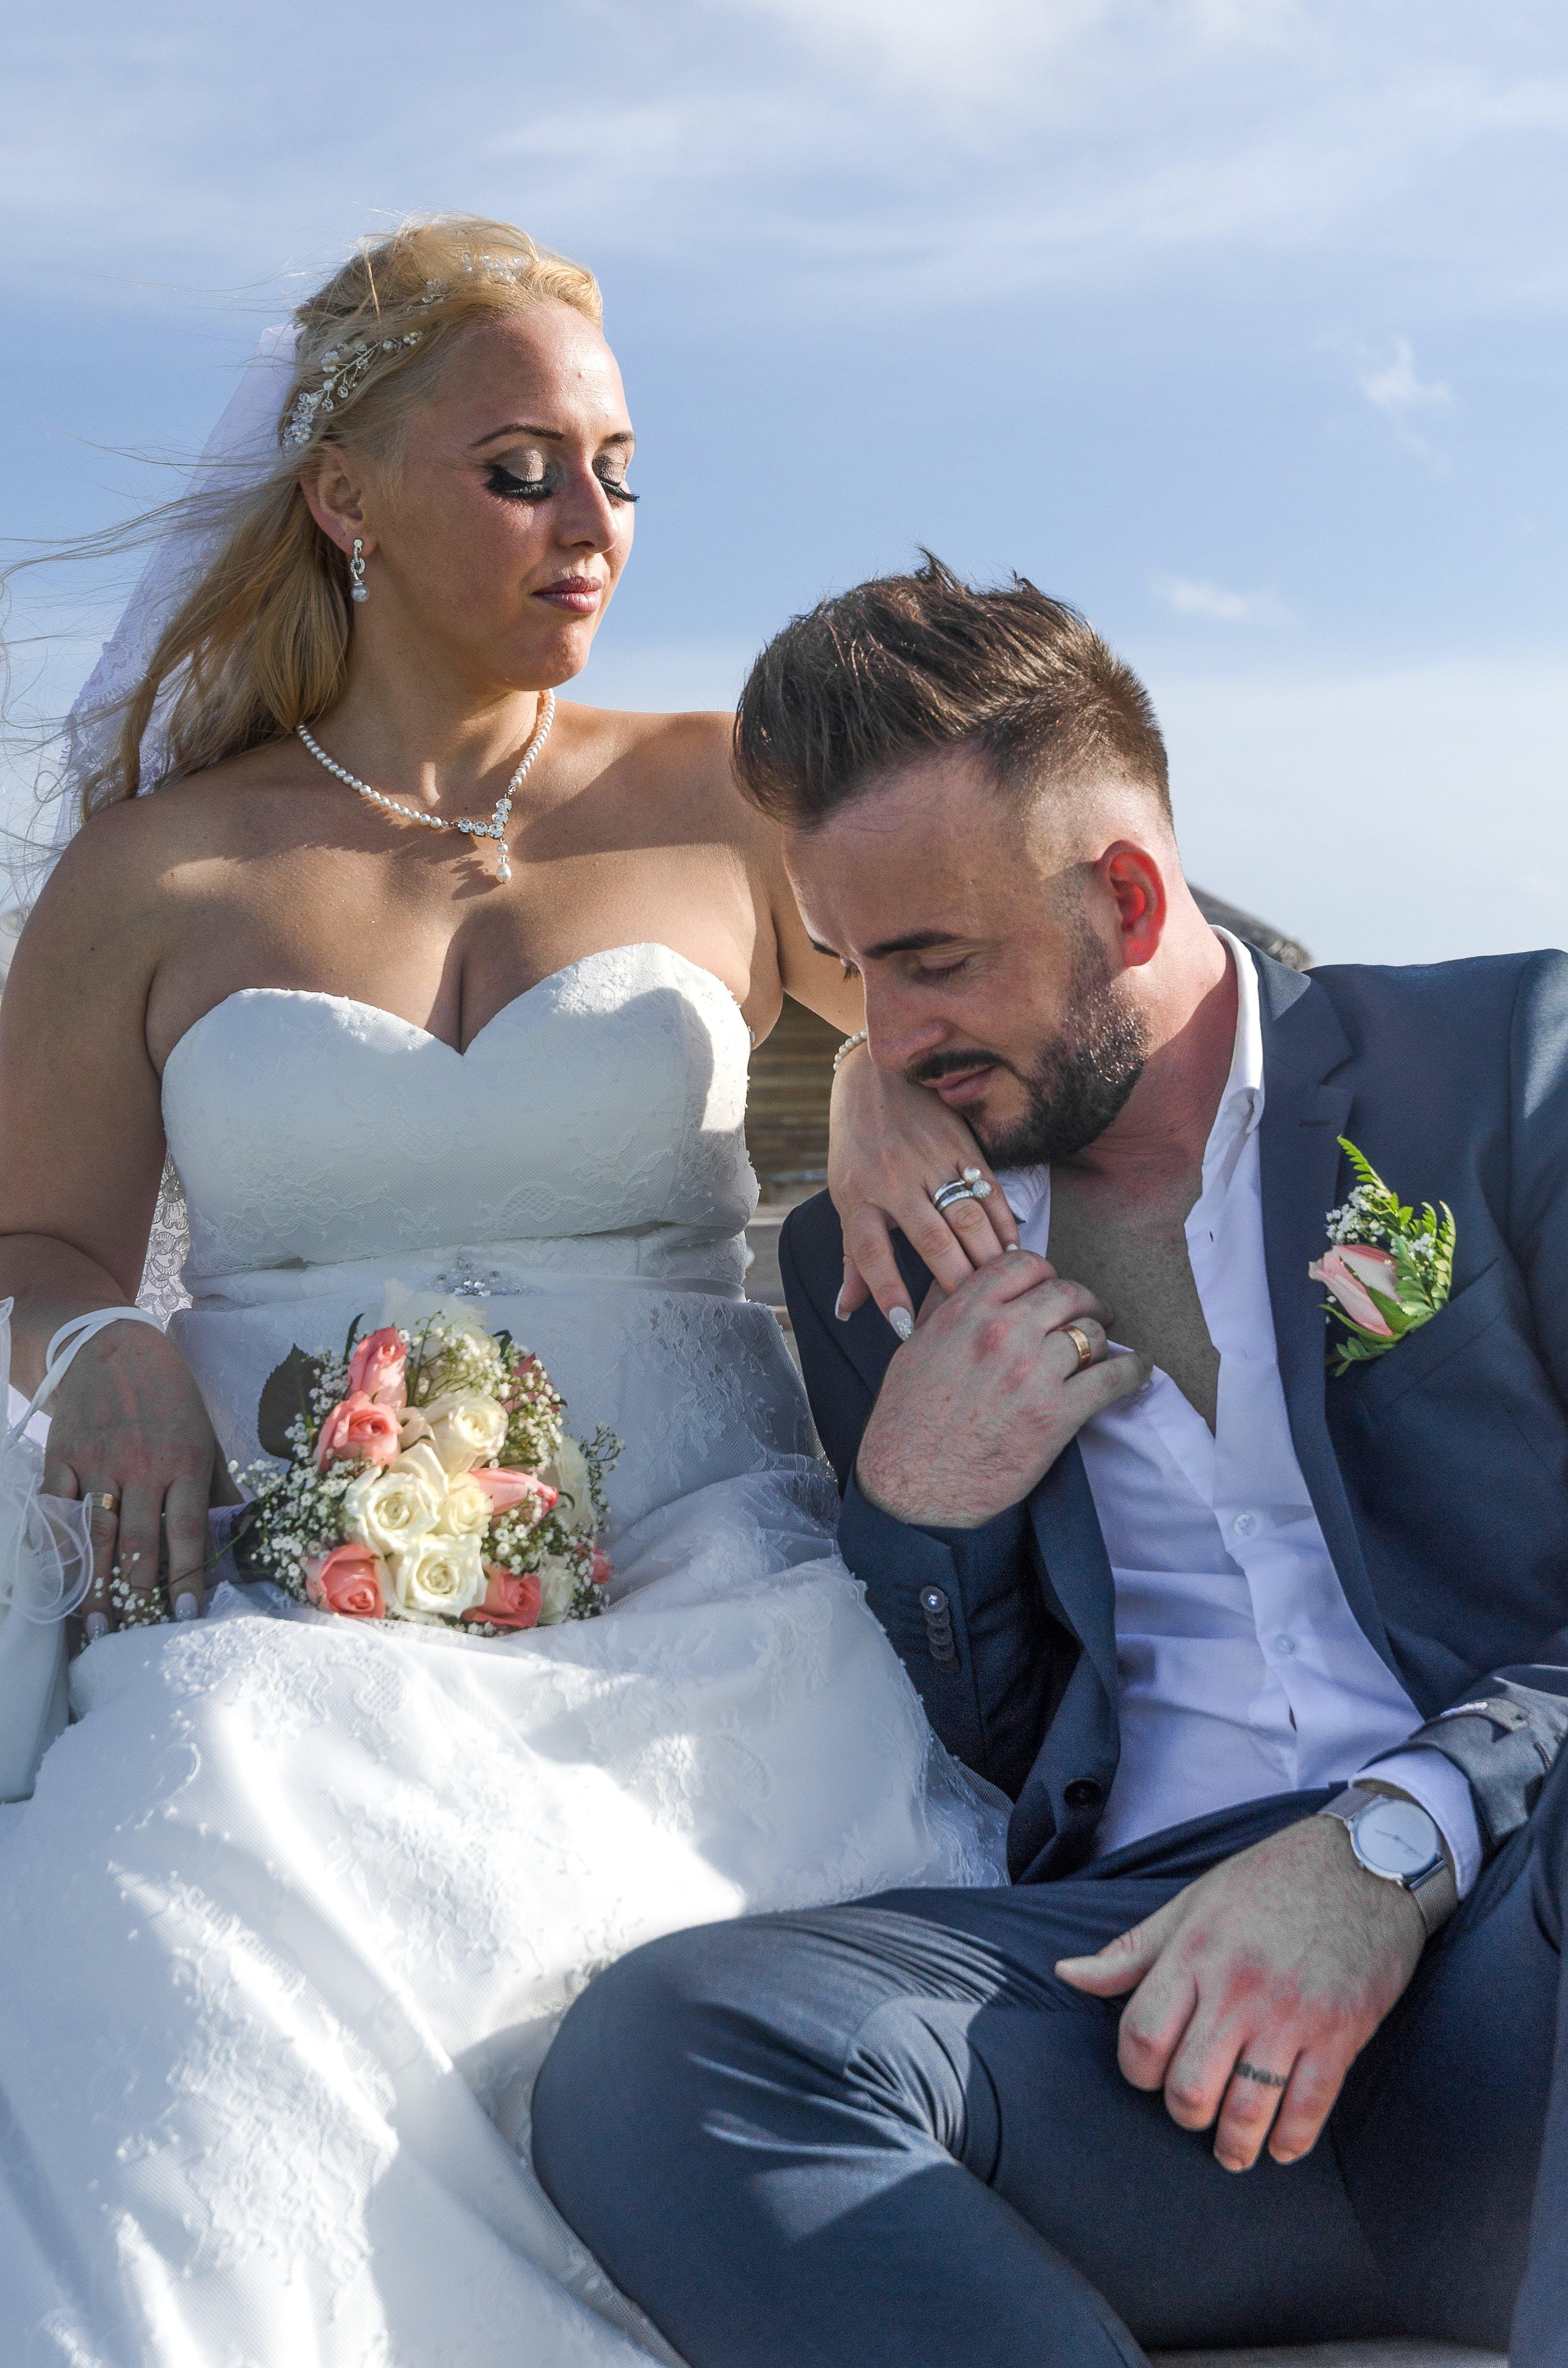 Kostenloses Stock Foto zu braut, braut und bräutigam, bräutigam, designeranzug